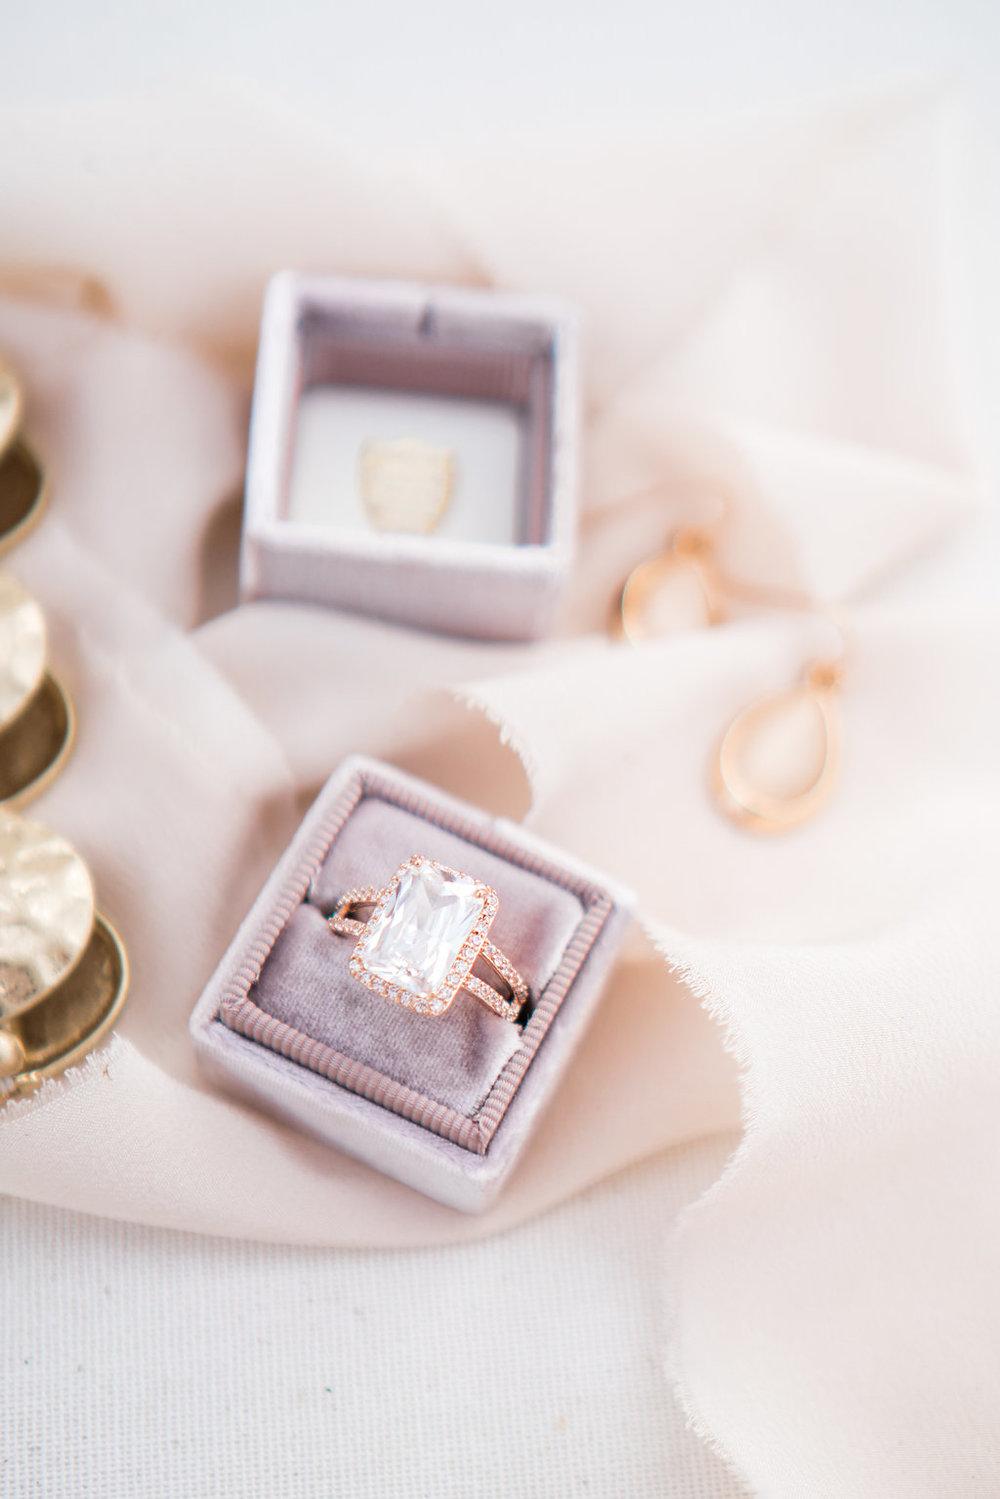 seattle-wedding-flower-design-sauvage-fleur-design-april-yentas-the-mrs-box-photo